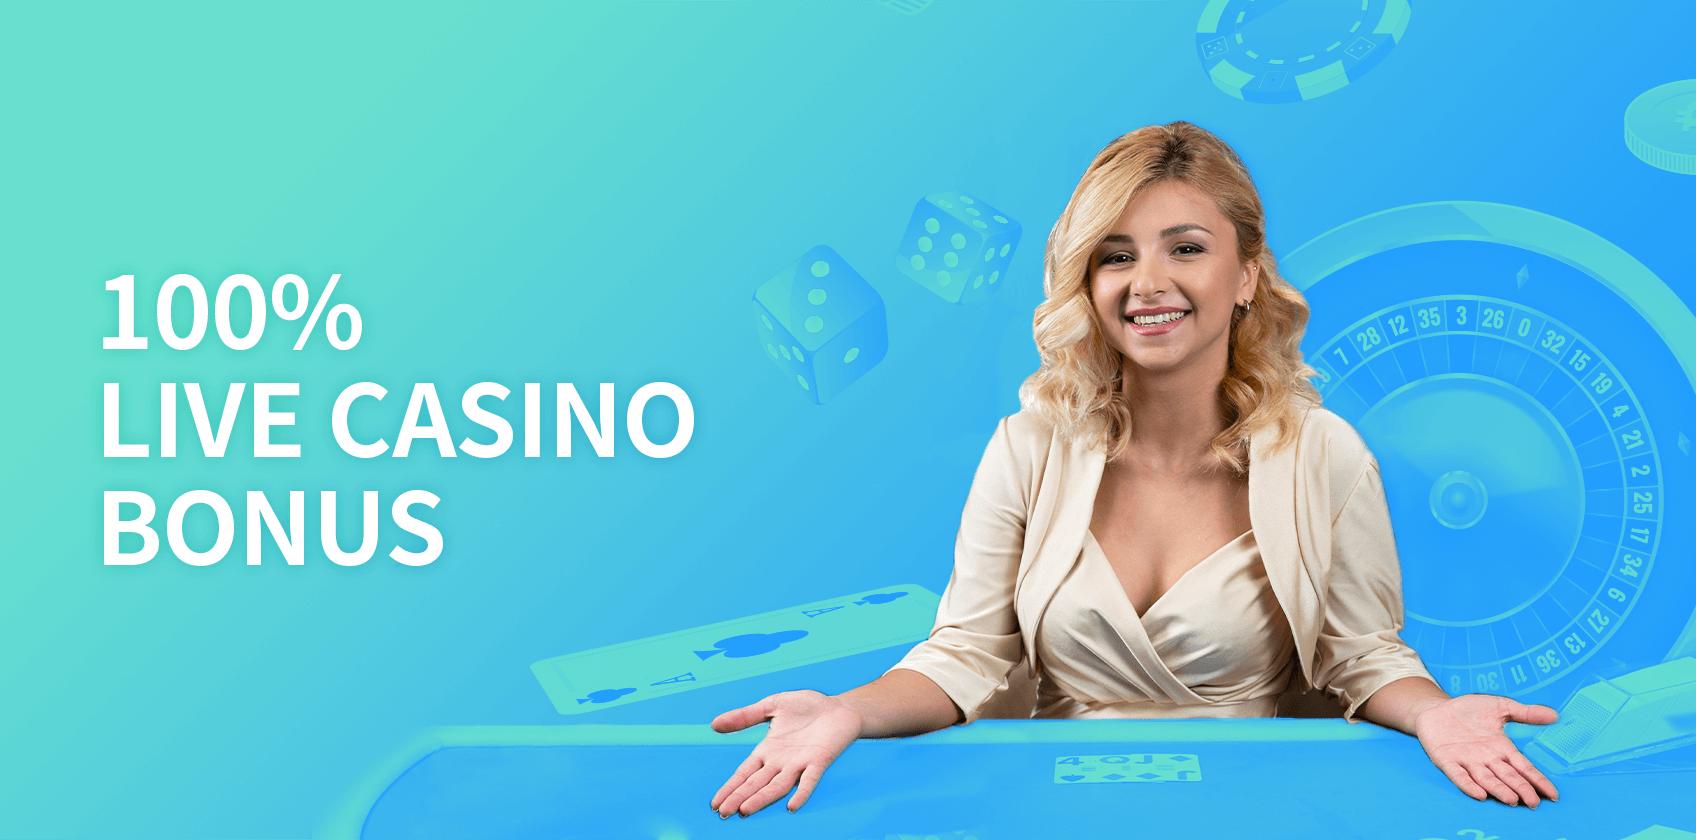 Exclusive Live Casino Bonus Up To 1btc